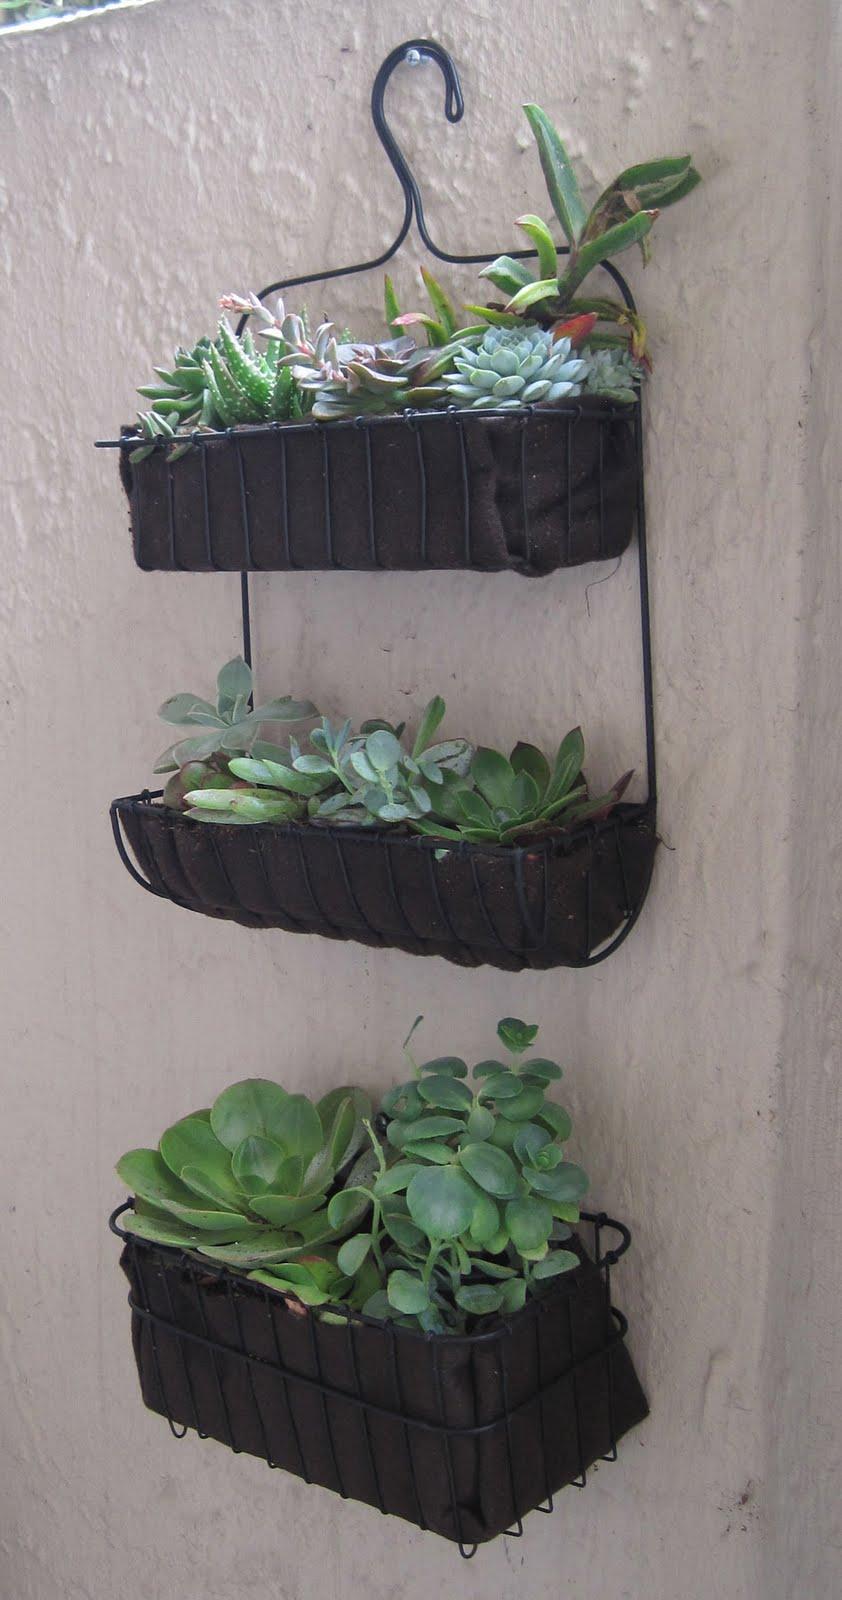 Wall Planters Ikea Bath Organizer To Succulent Garden Ikea Hackers Ikea Hackers